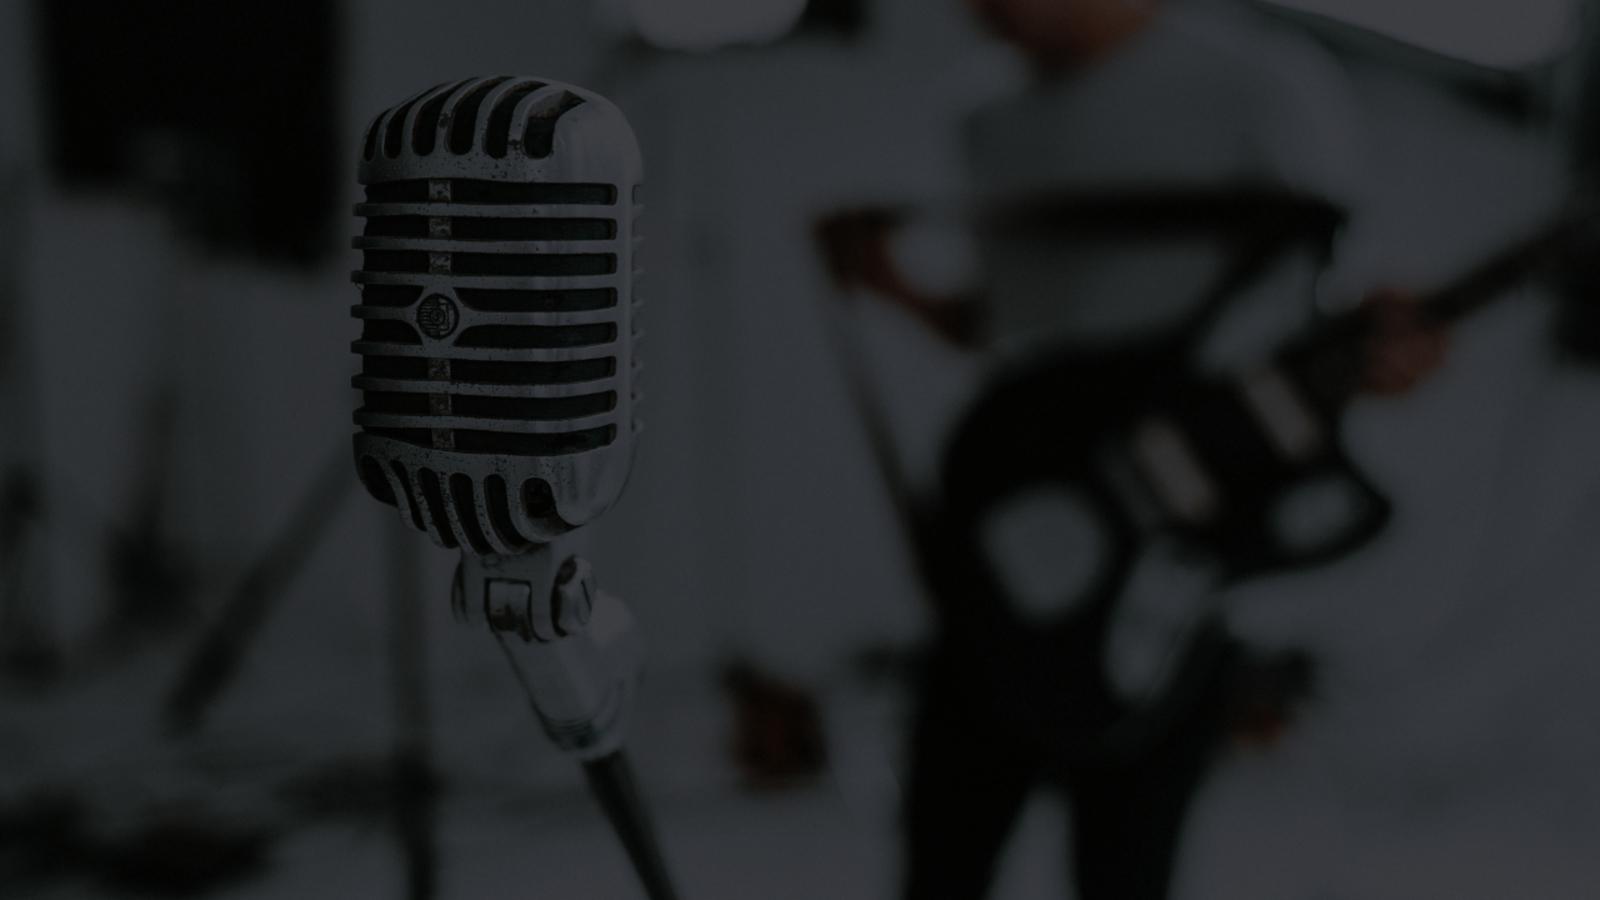 Real Feel - Vocal Fit: Online Gesangsübungen mit Band Feeling